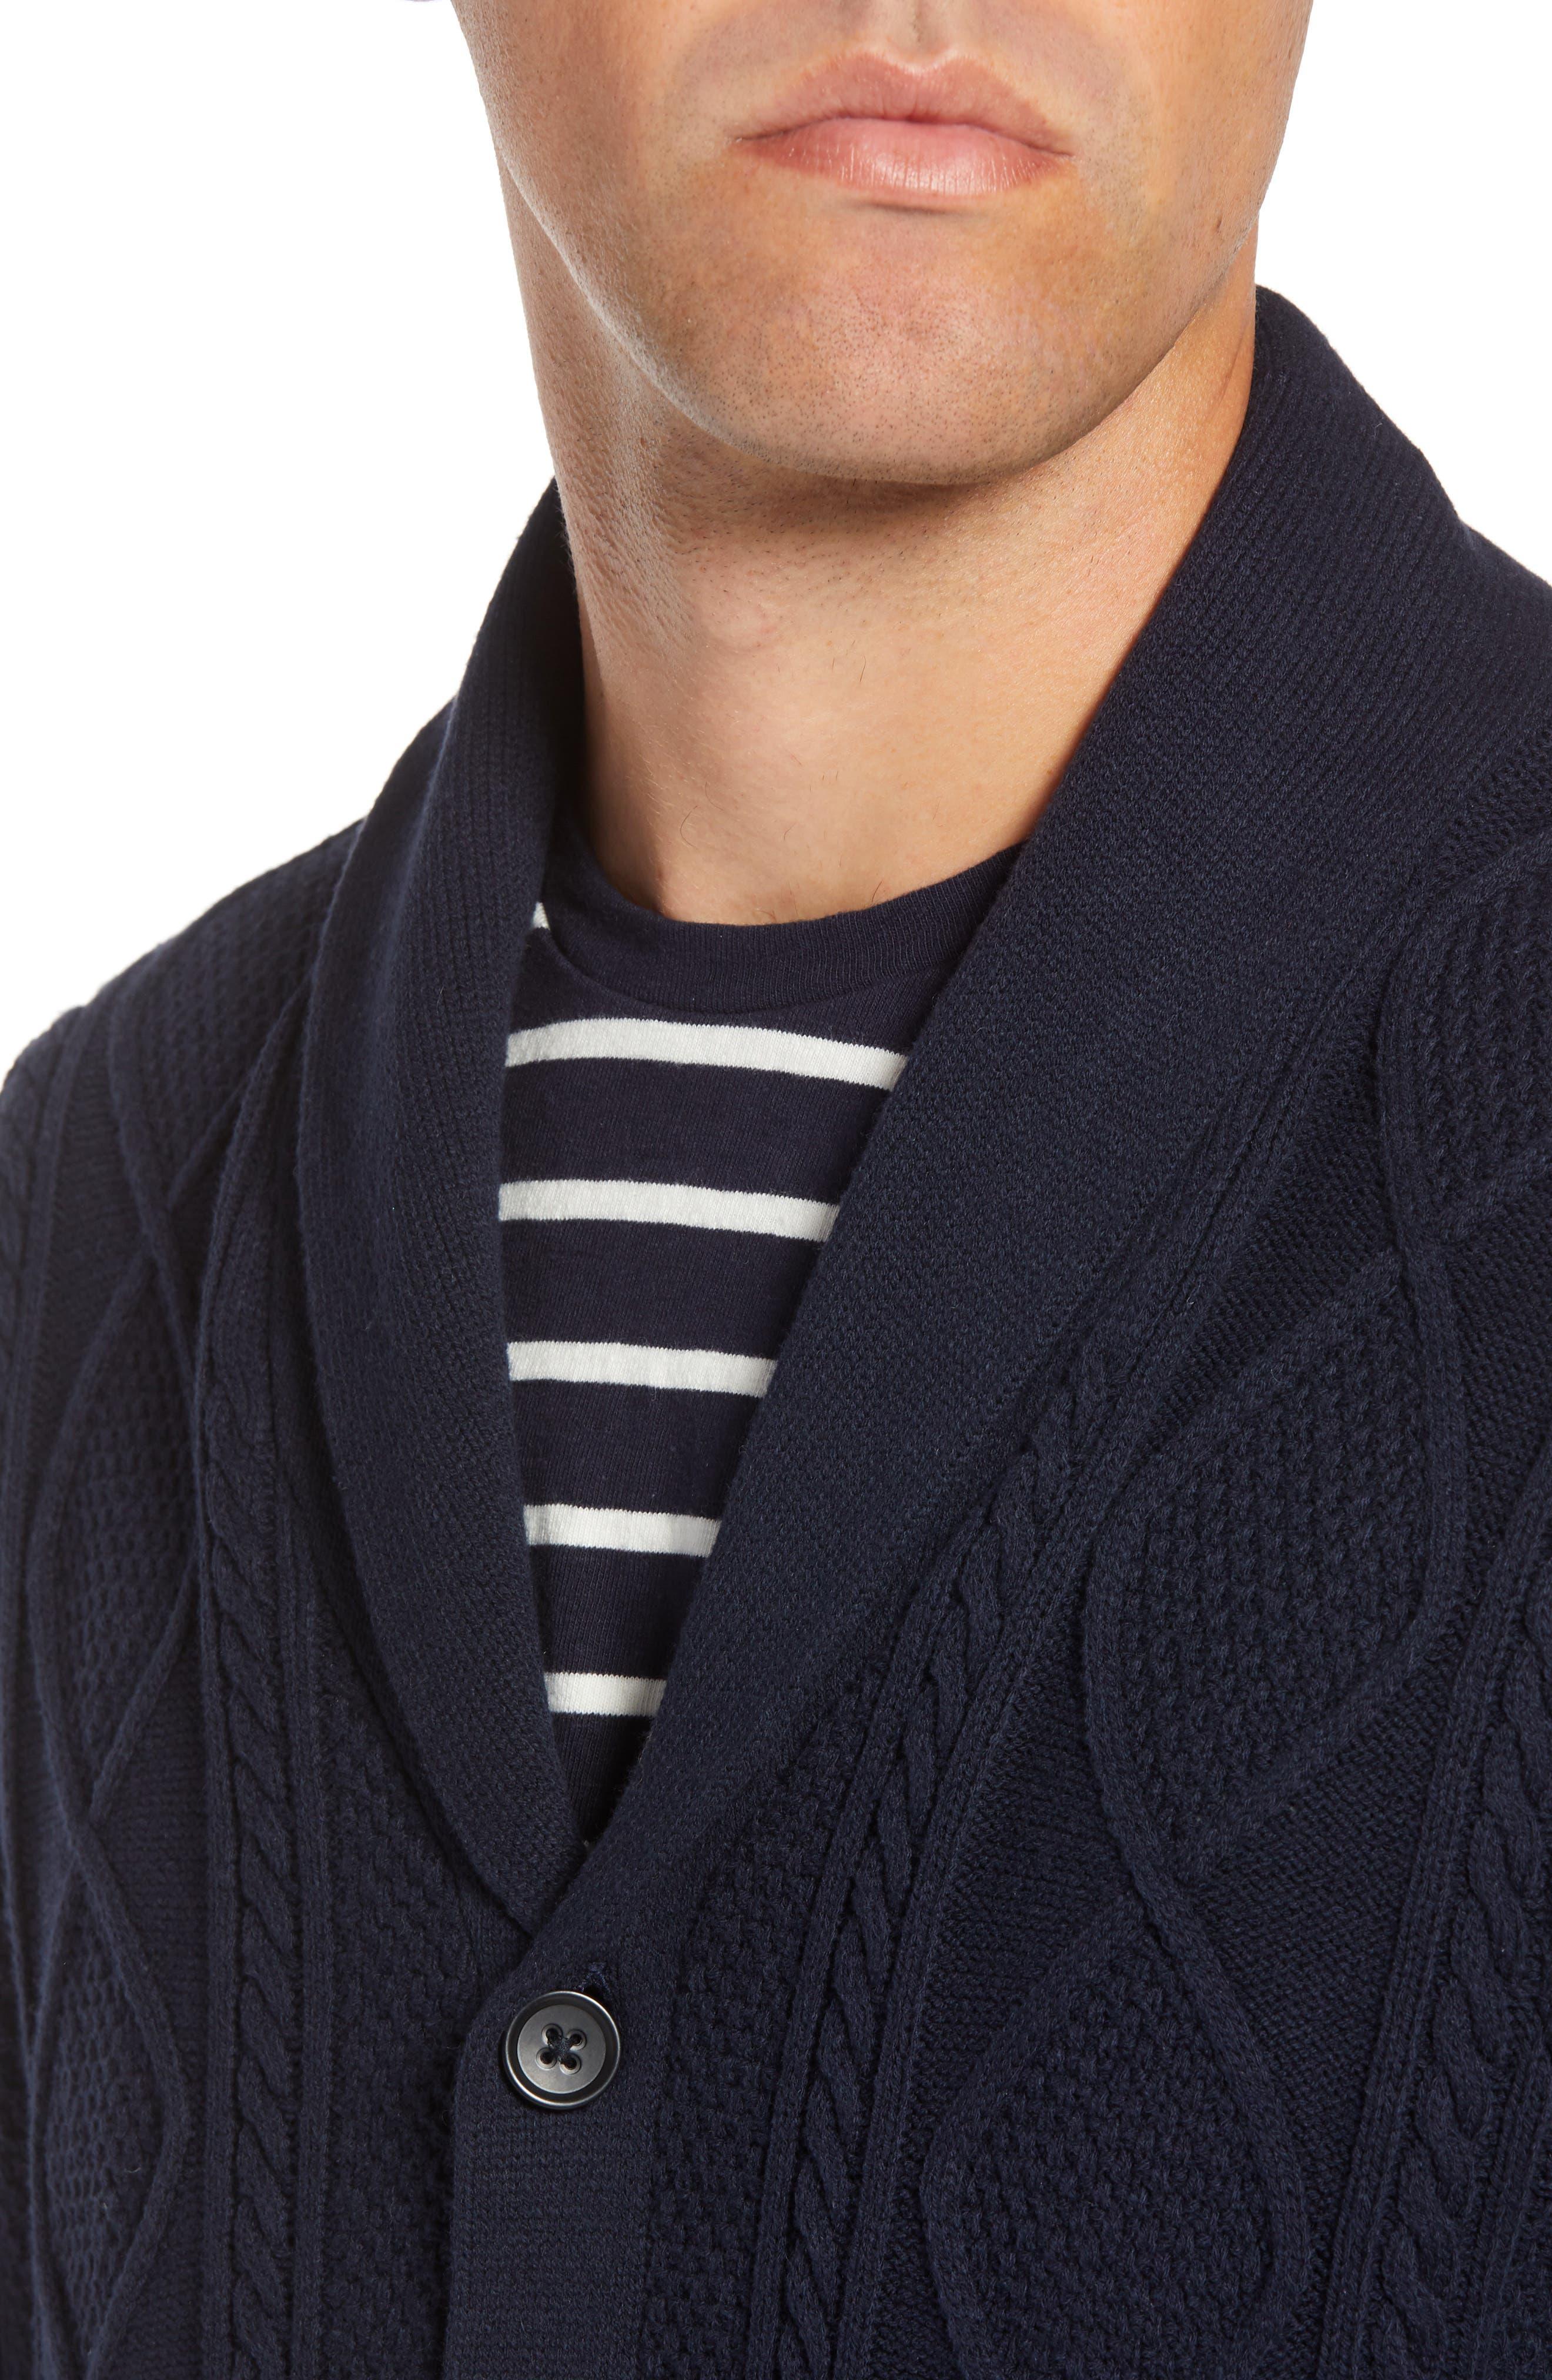 Cable Knit Shawl Collar Cardigan,                             Alternate thumbnail 4, color,                             NAVY NIGHT